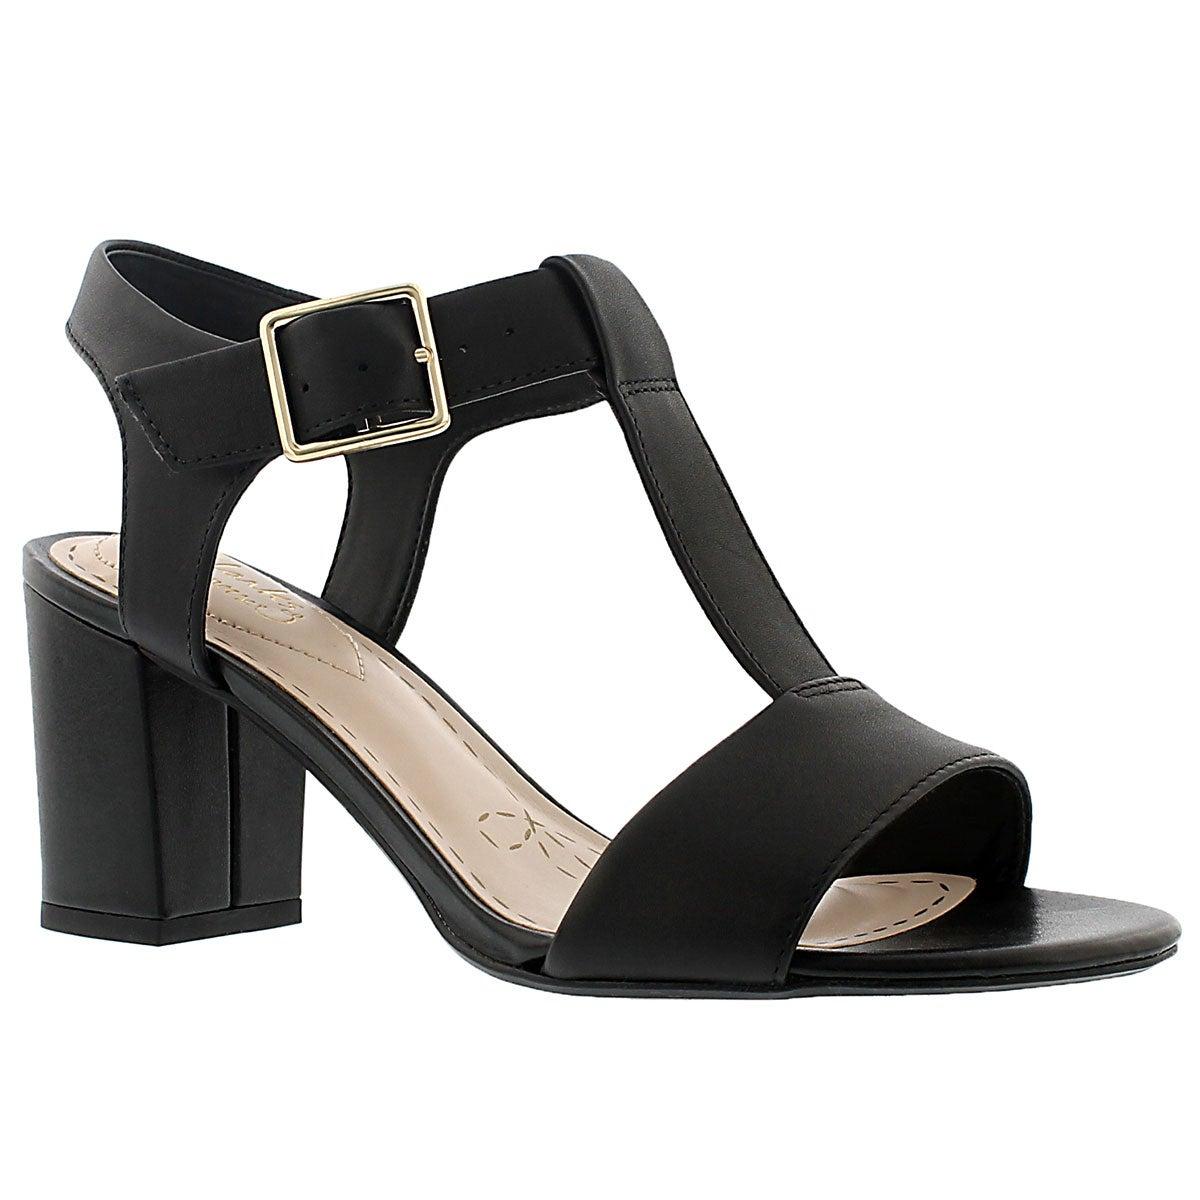 Lds Smart Deva blk t-strap dress sandal